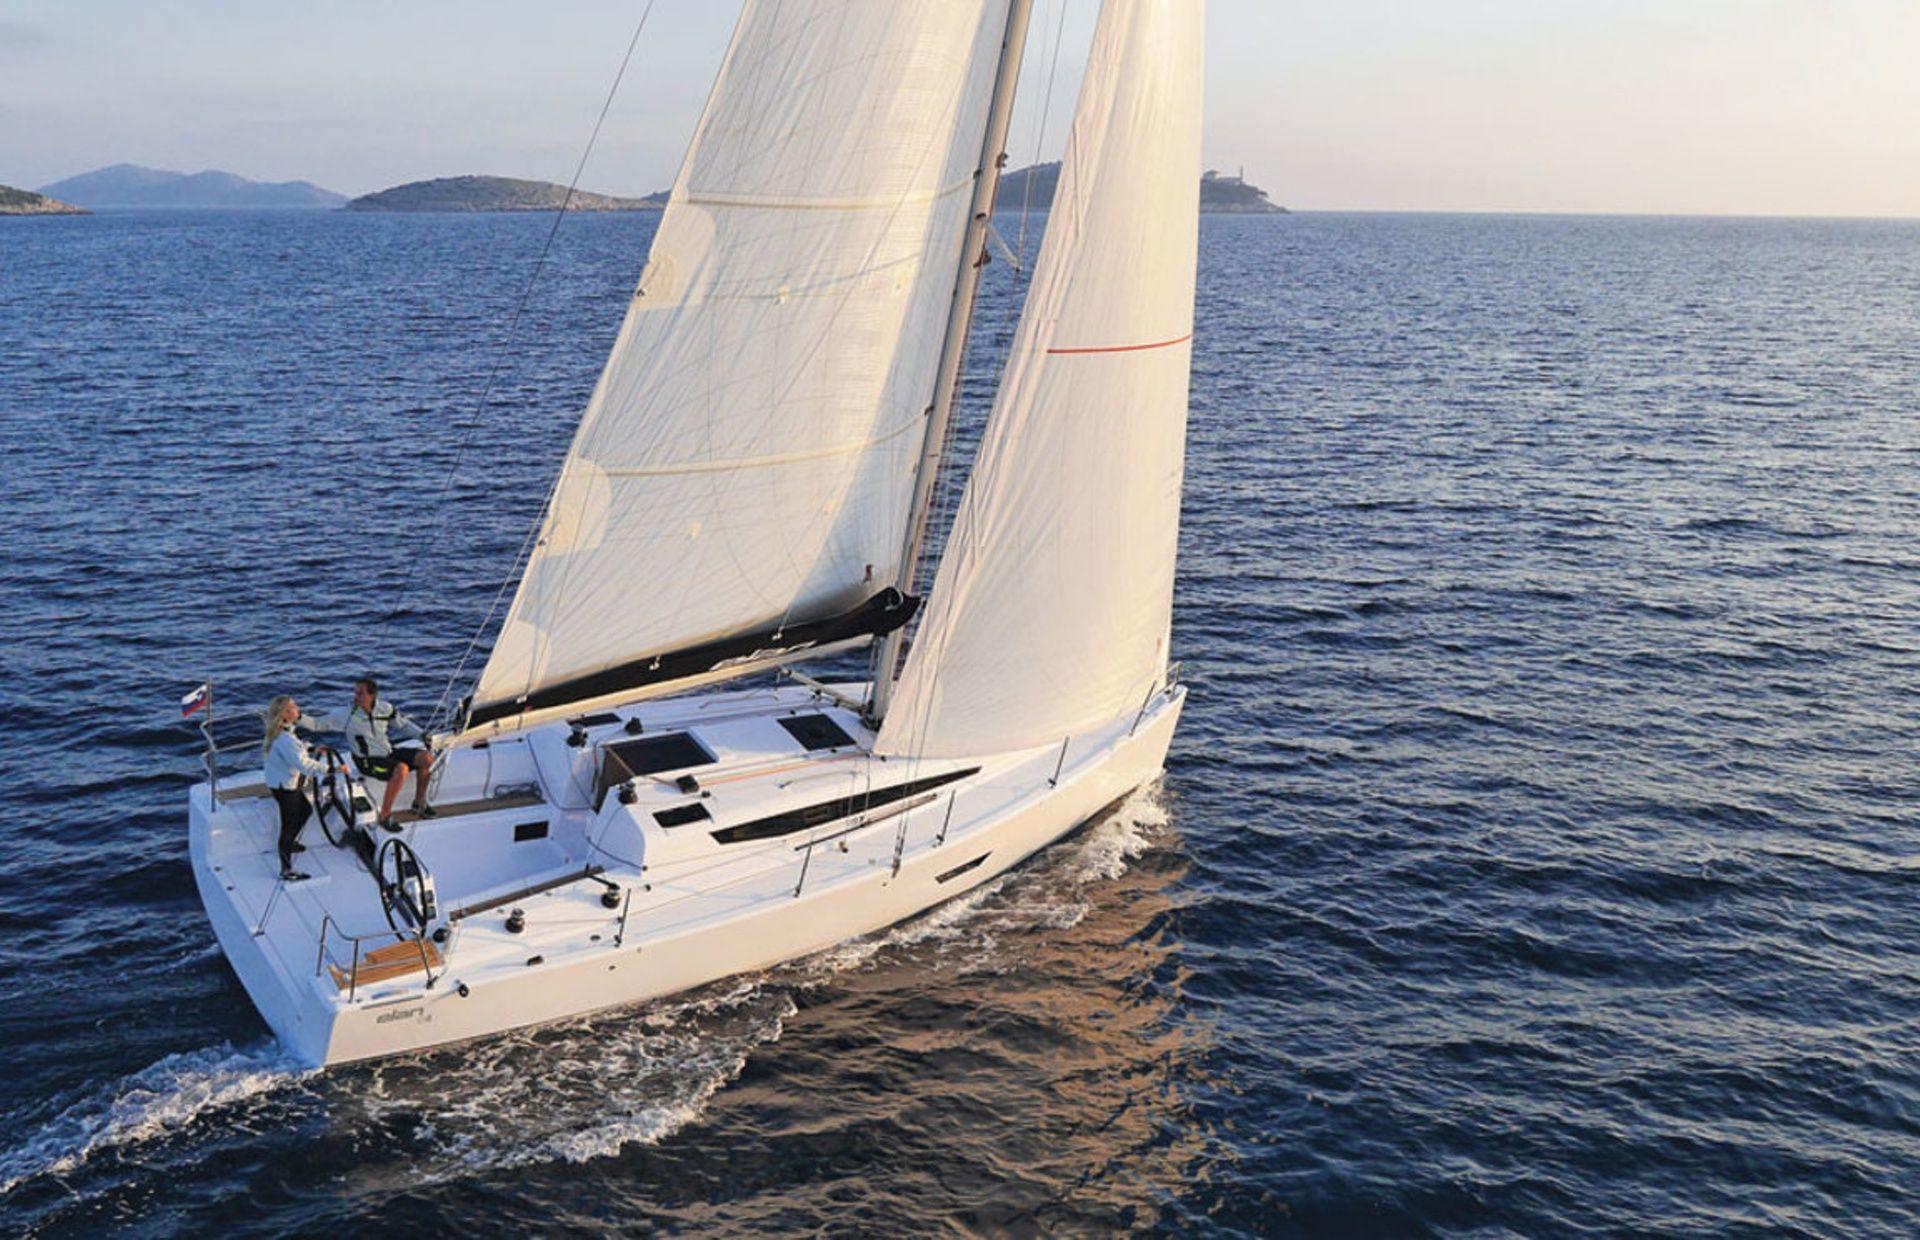 https://media.insailing.com/boat/sailing-yacht/image_1582636395576.jpg